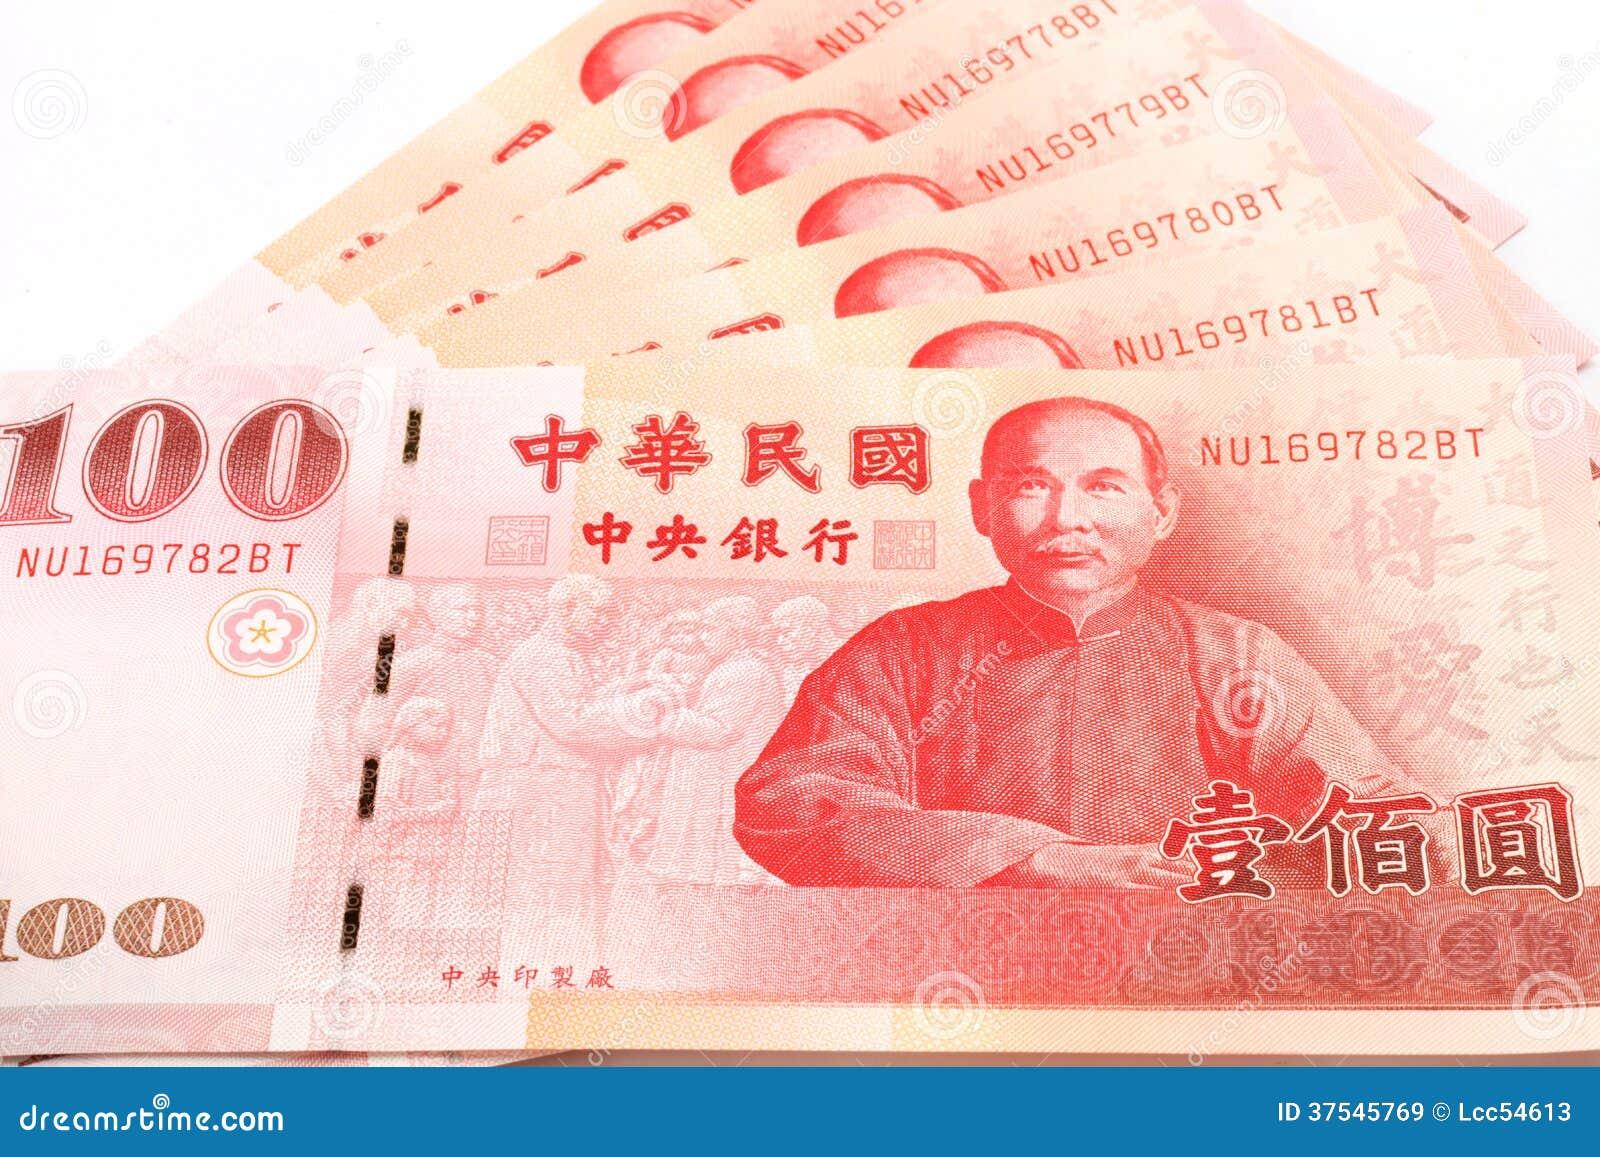 New Taiwan Dollar Bill Stock Image Image Of Bill Money 37545769